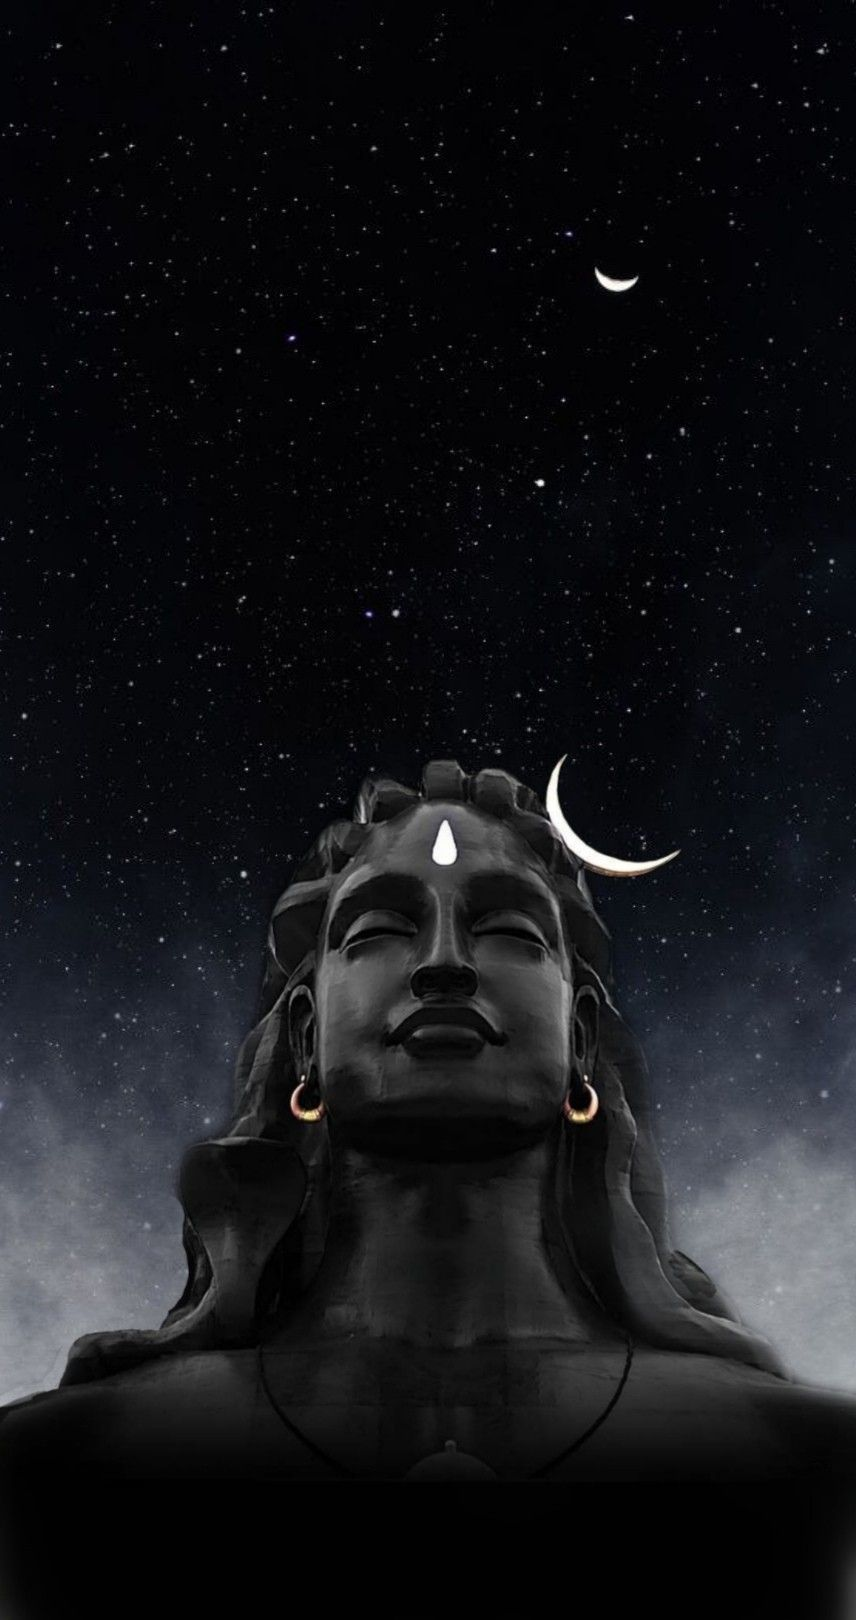 Dark Mahadev Hd Wallpapers Top Free Dark Mahadev Hd Backgrounds Wallpaperaccess